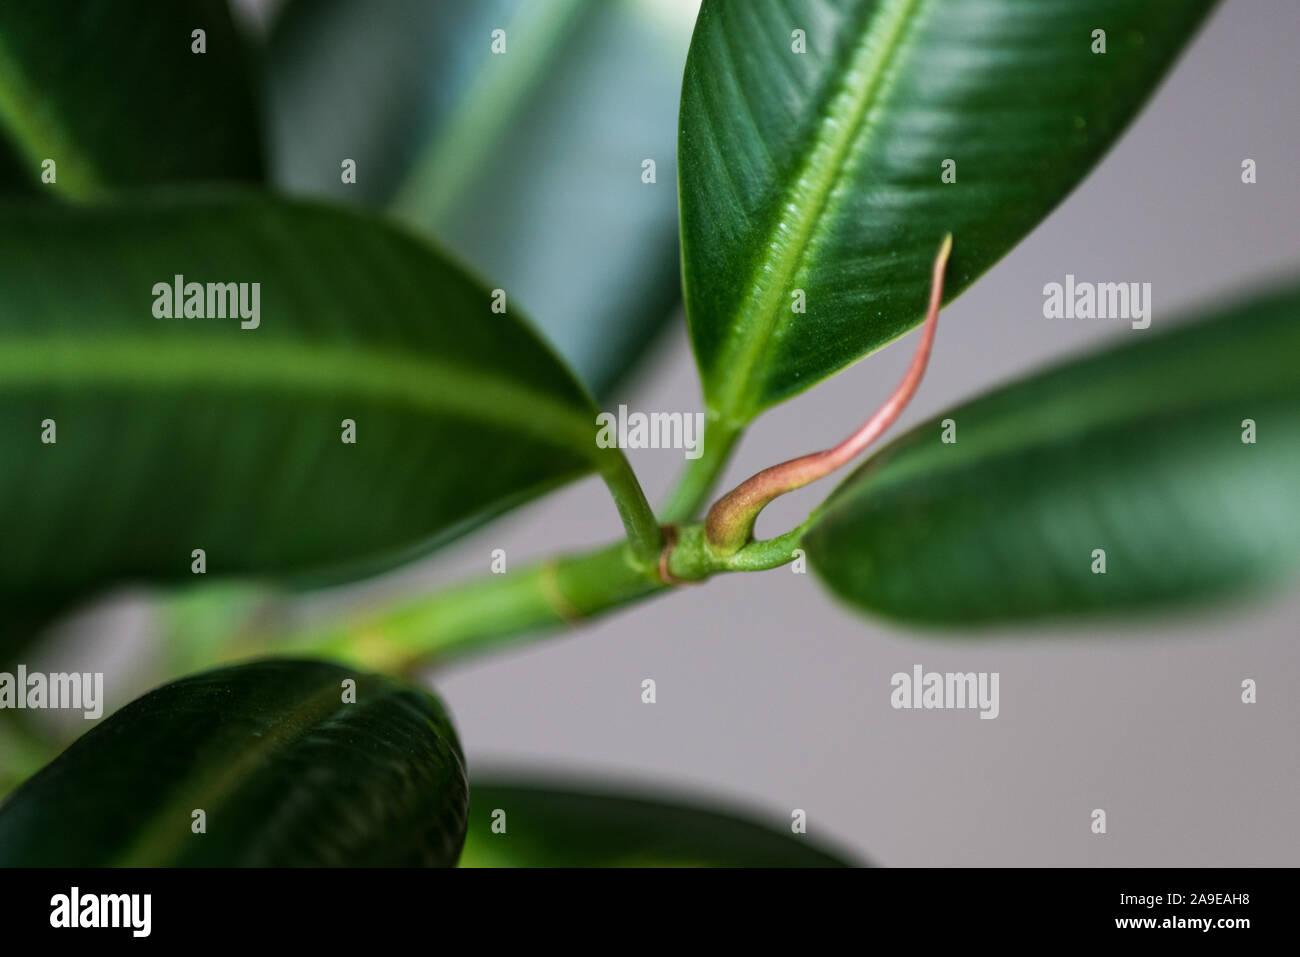 Potare Il Ficus Elastica weeping ficus immagini & weeping ficus fotos stock - alamy